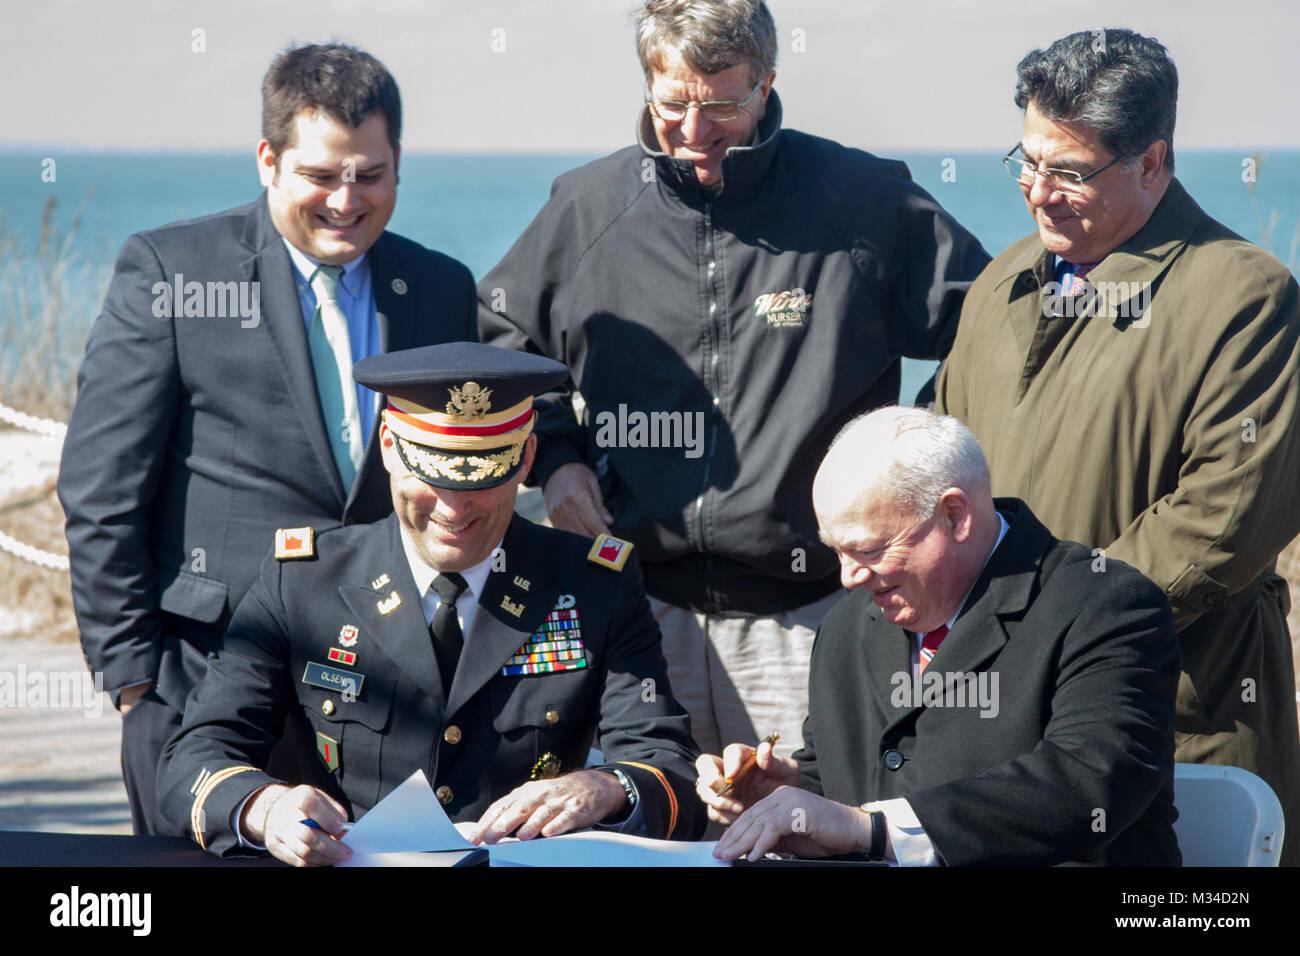 NORFOLK, Virginia - Col. Paul Olsen, Distretto di Norfolk commander, e Paolo Fraim; sindaco di Norfolk, Virginia; Immagini Stock